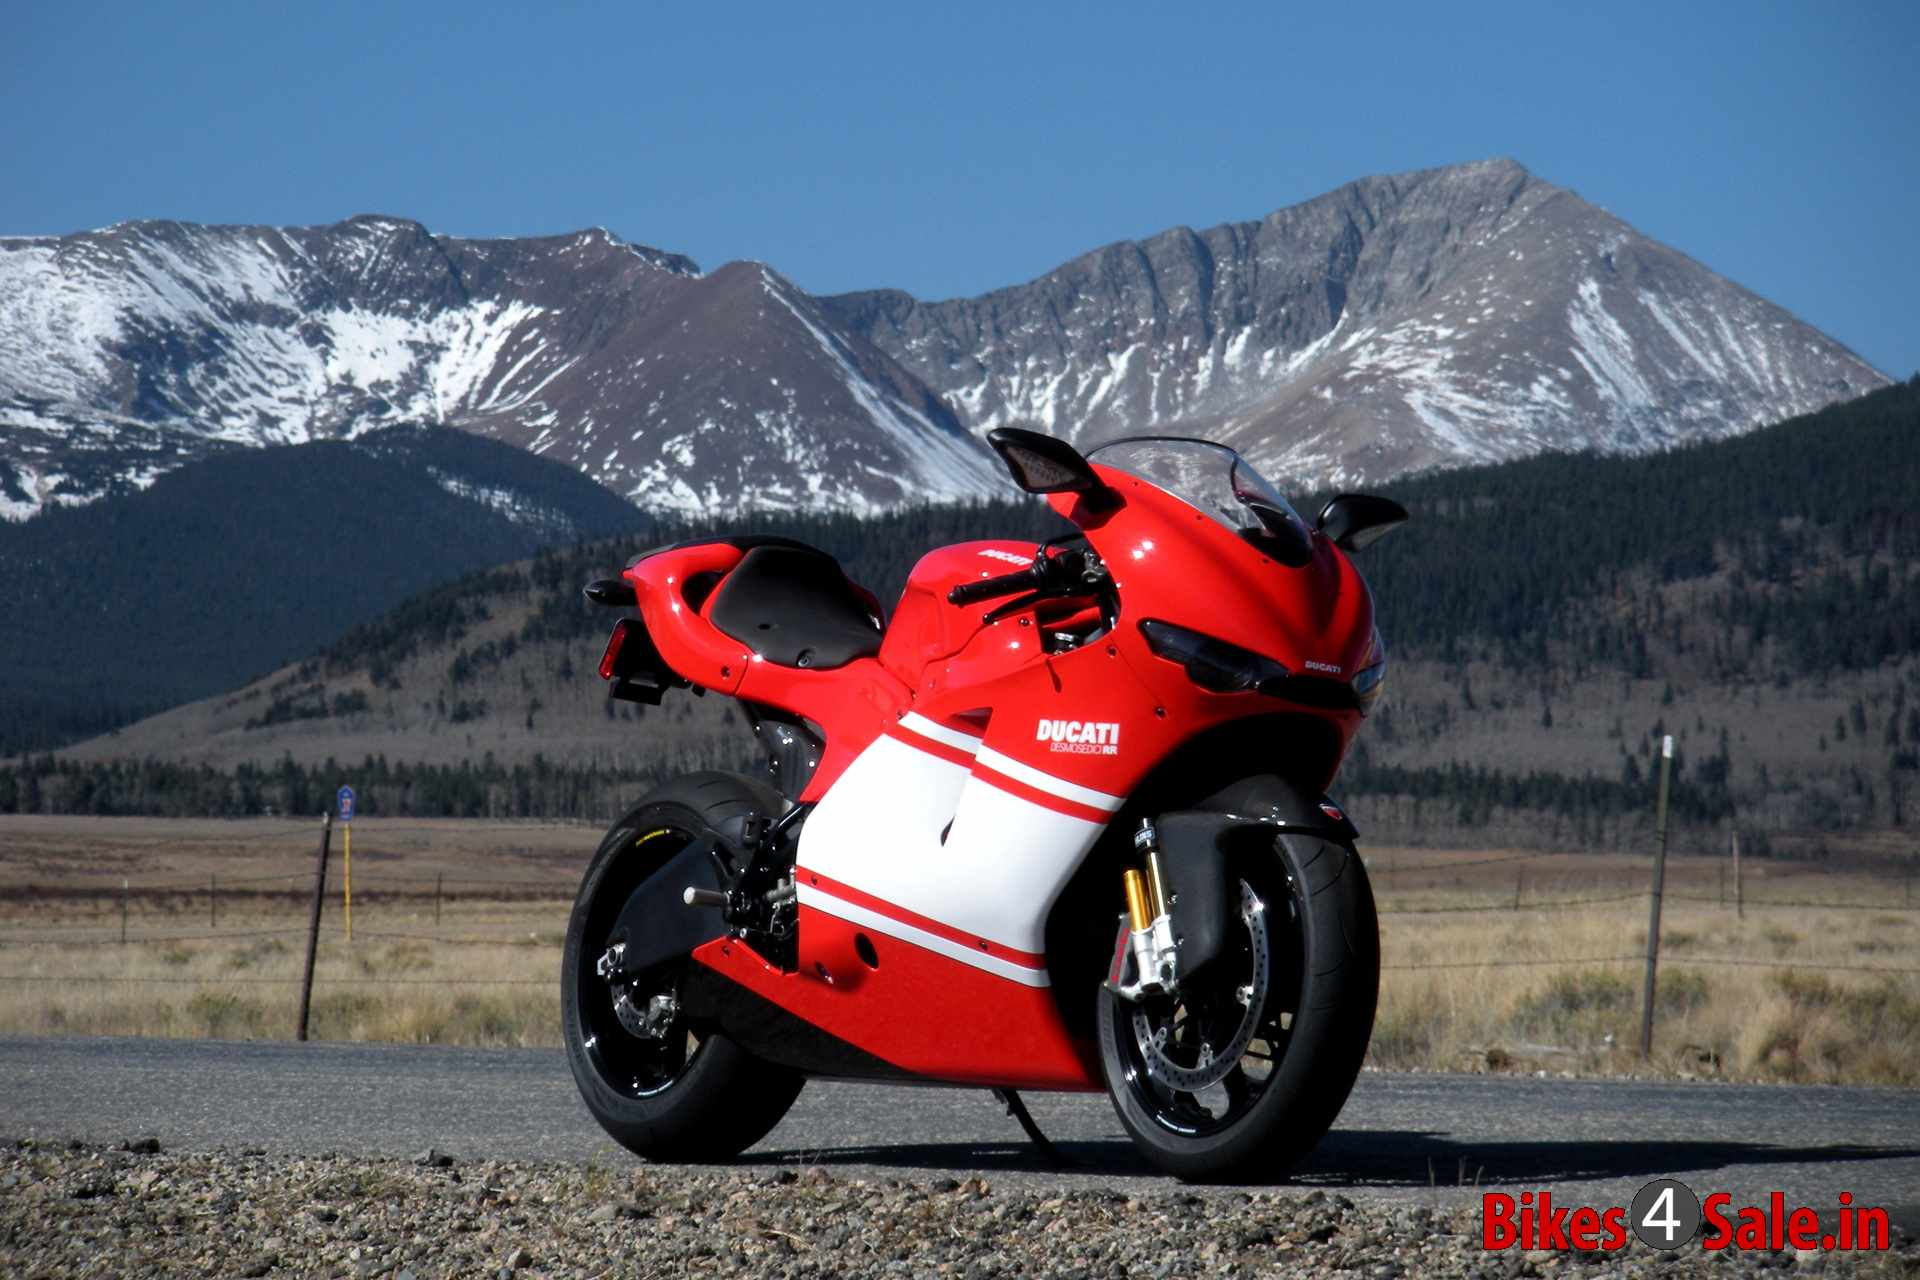 Ducati Rr Desmosedici Top Speed